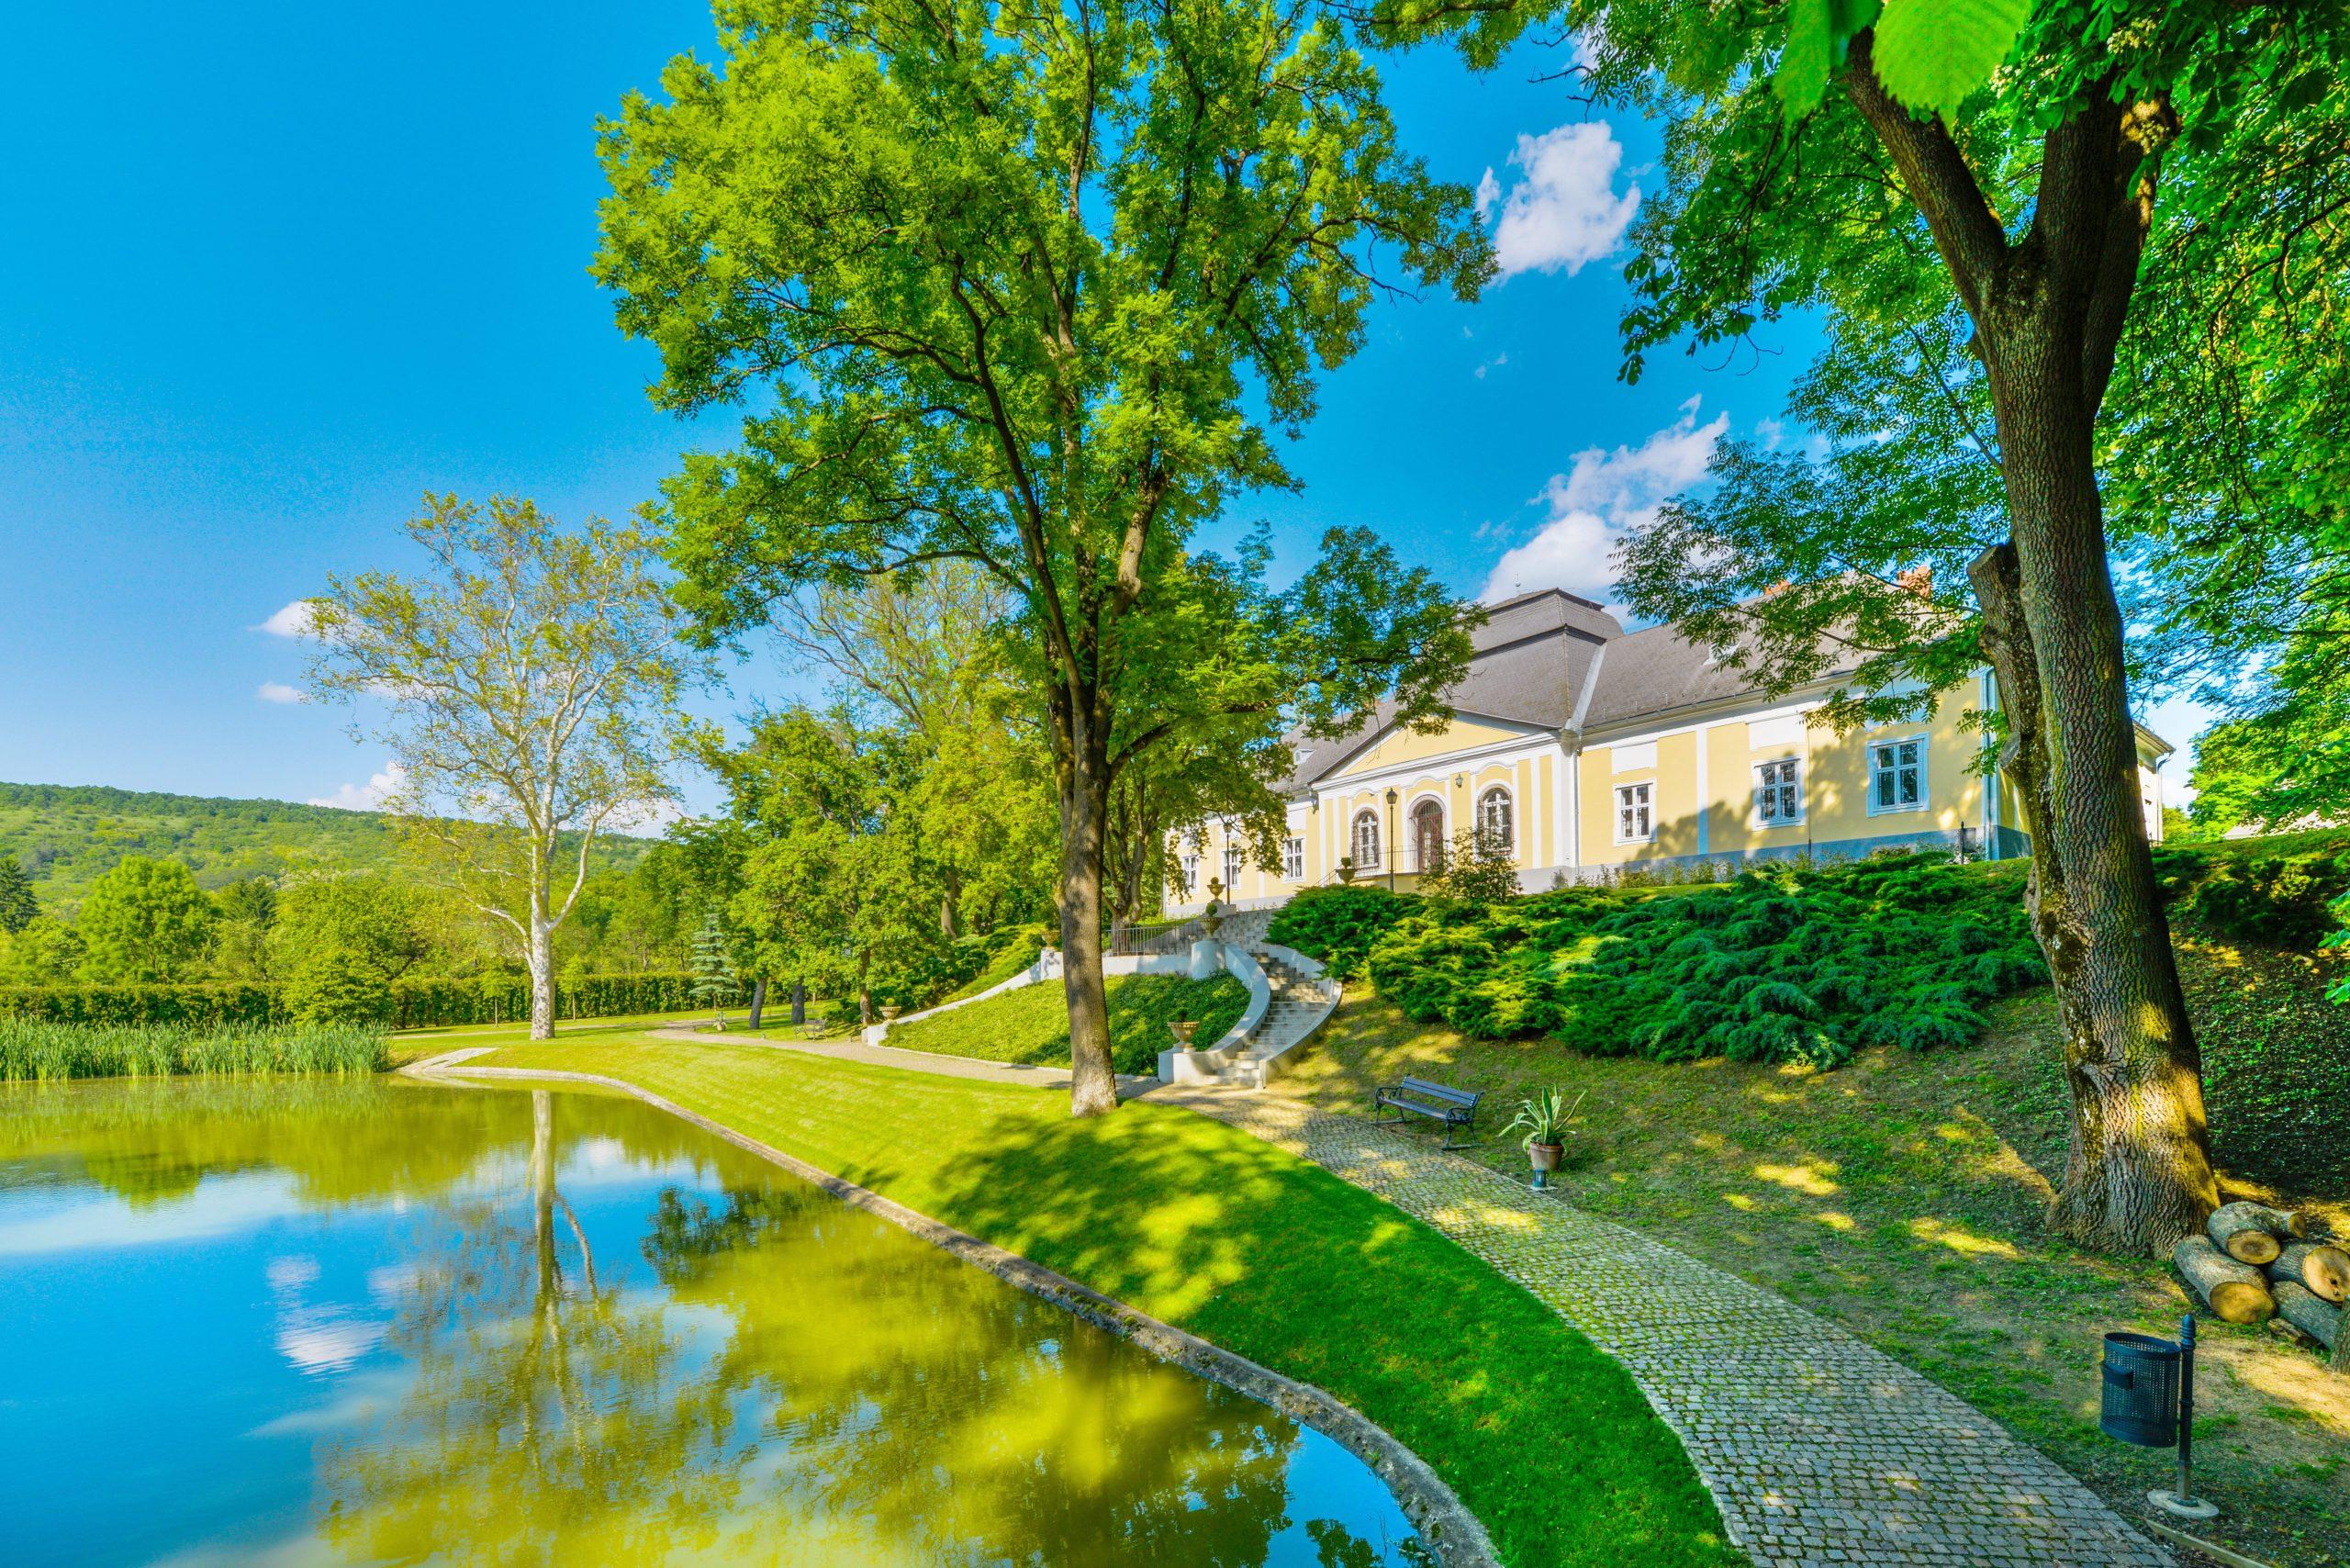 Vidéki kastélypark ad otthont a leghangulatosabb családi pikniknek júniusban